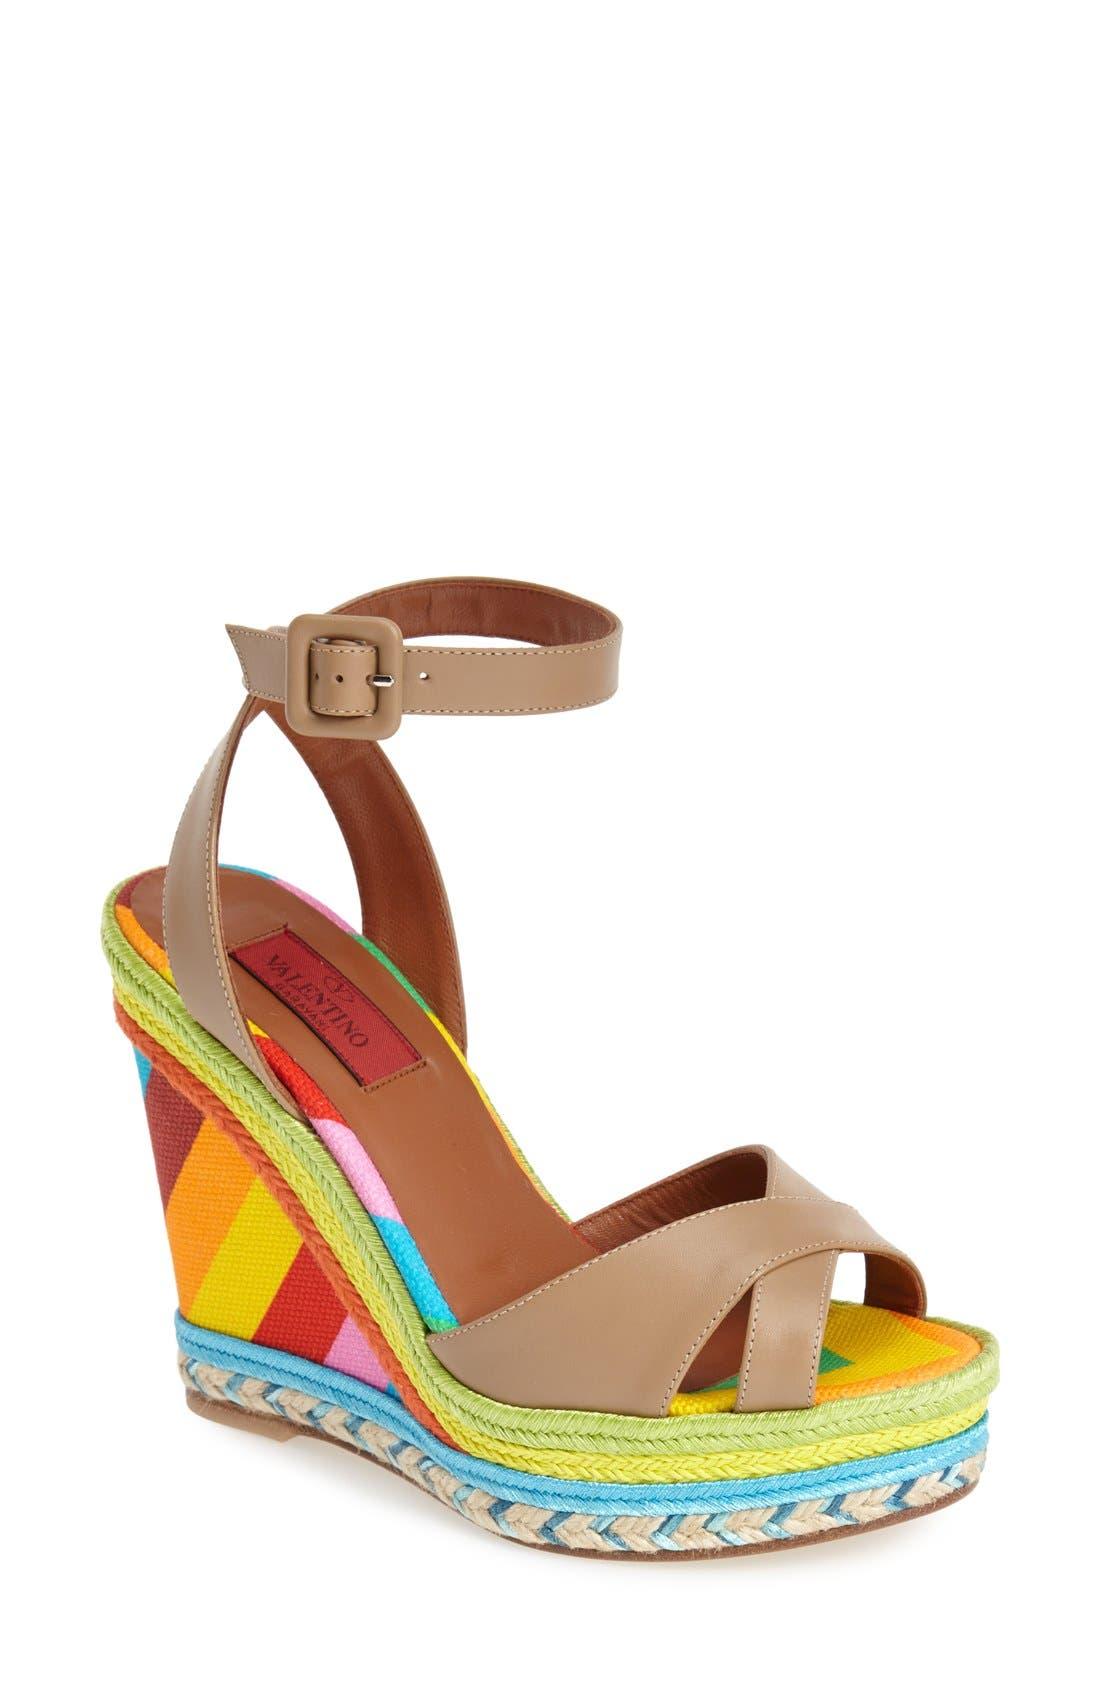 Main Image - Valentino Espadrille Wedge Sandal (Women)